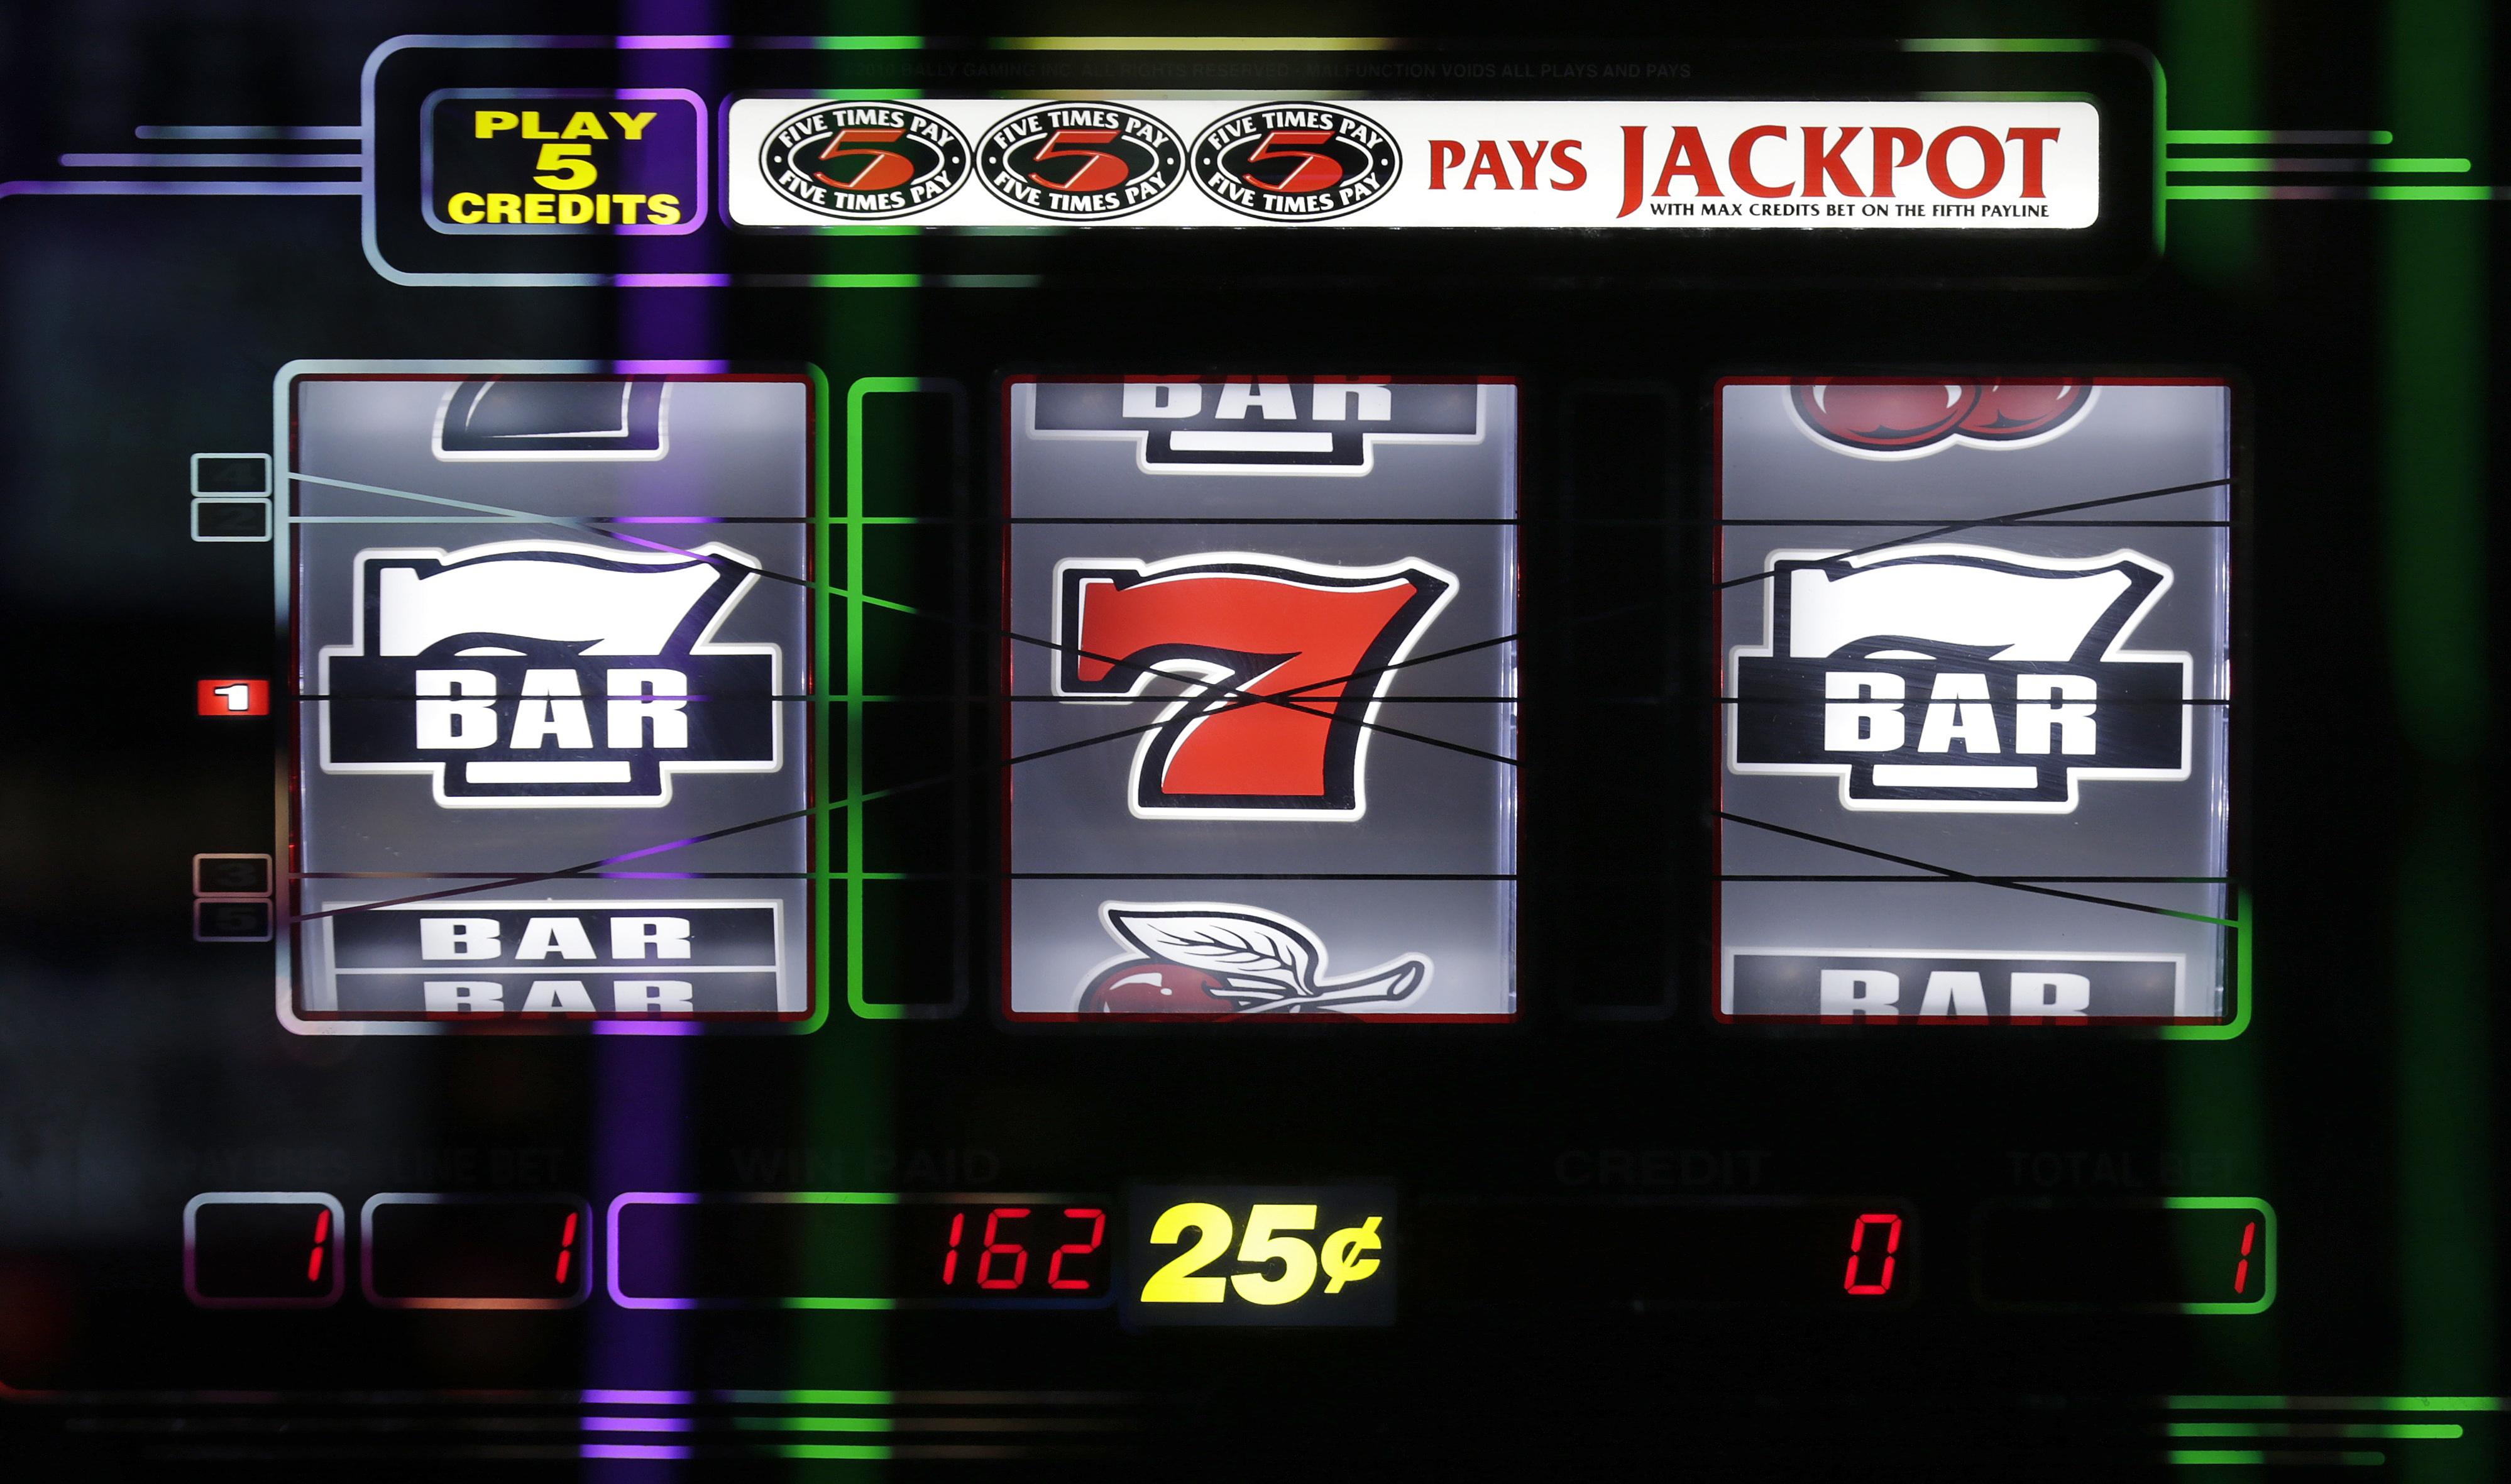 laser gambling center hotline addiction